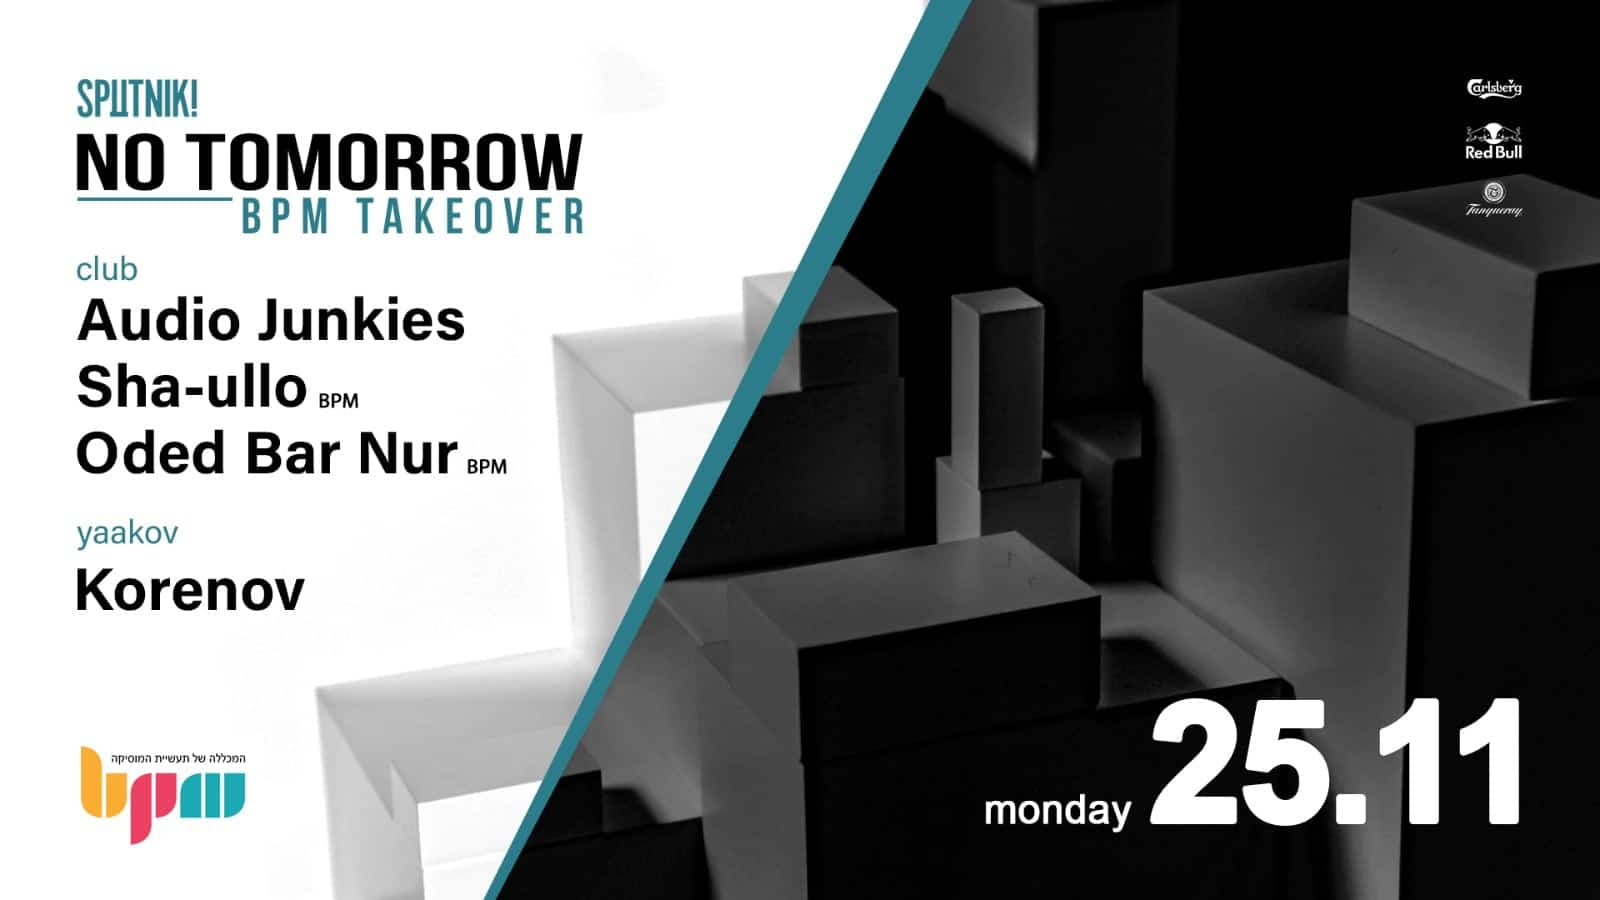 No tomorrow - Bpm TakeOver ב-Sputnik Bar, הטבות לקהילת BPM